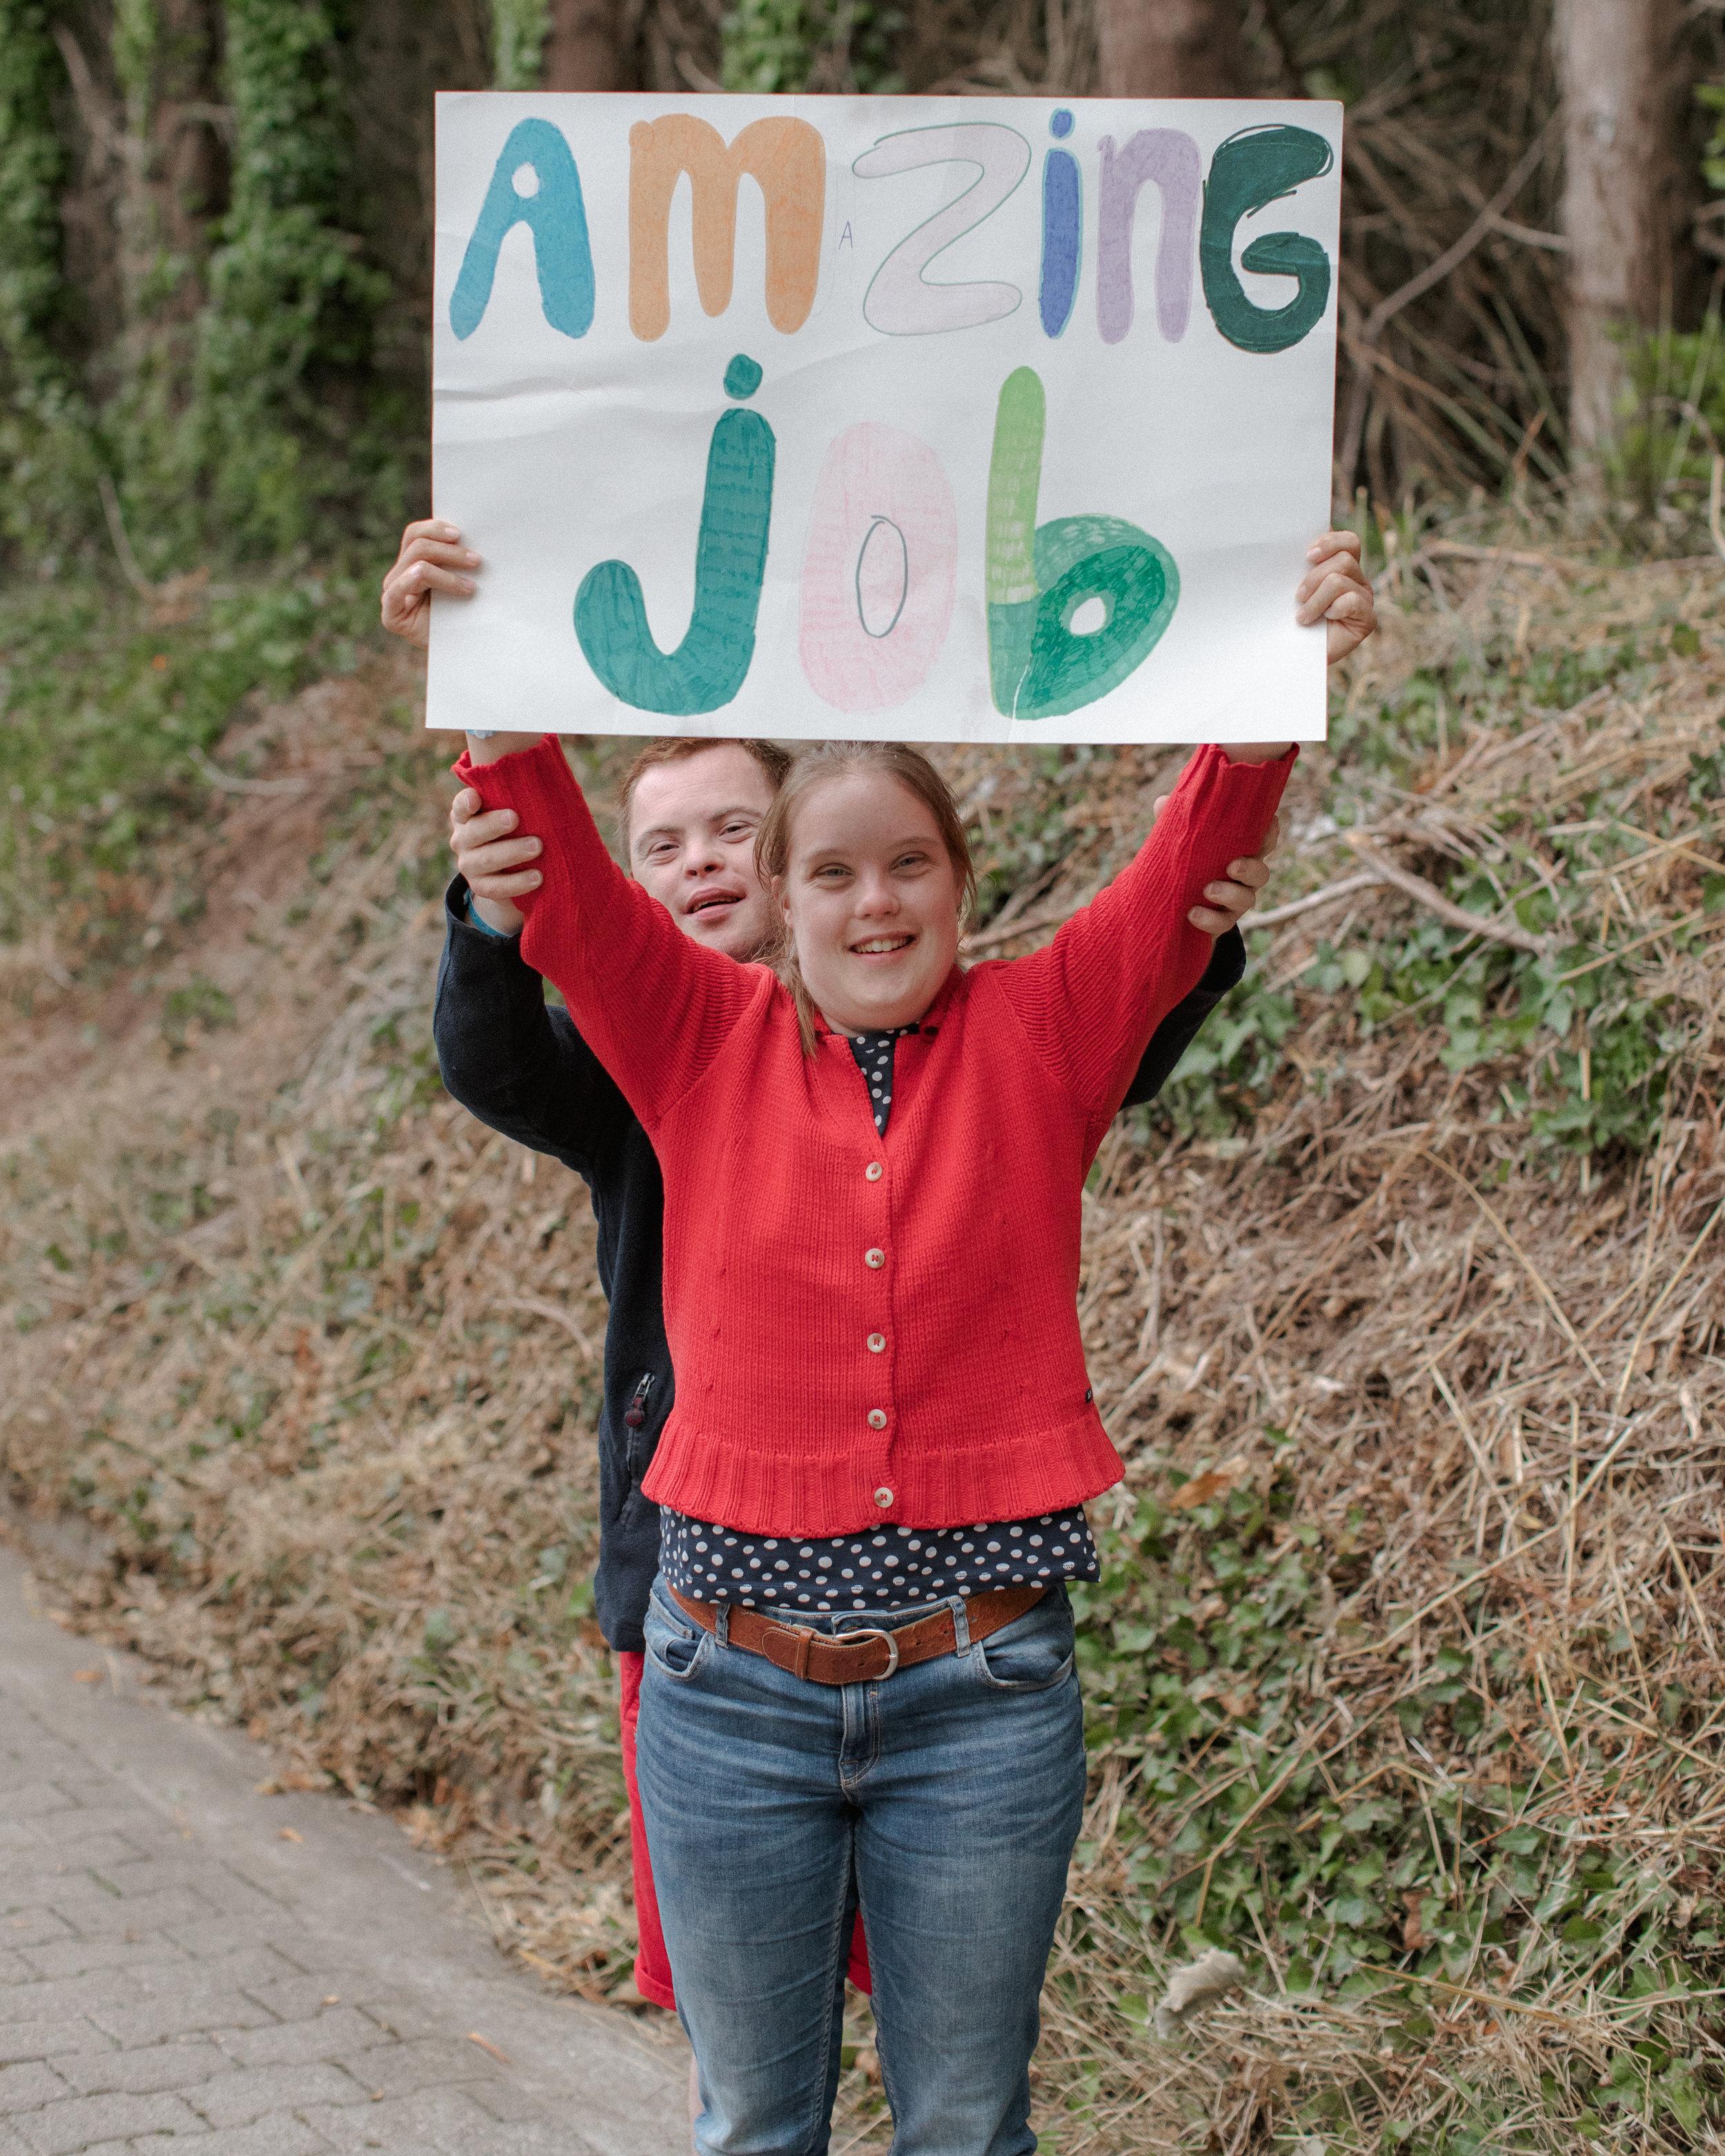 Job_sign_finishline_Angus_Sung_Photo.jpg